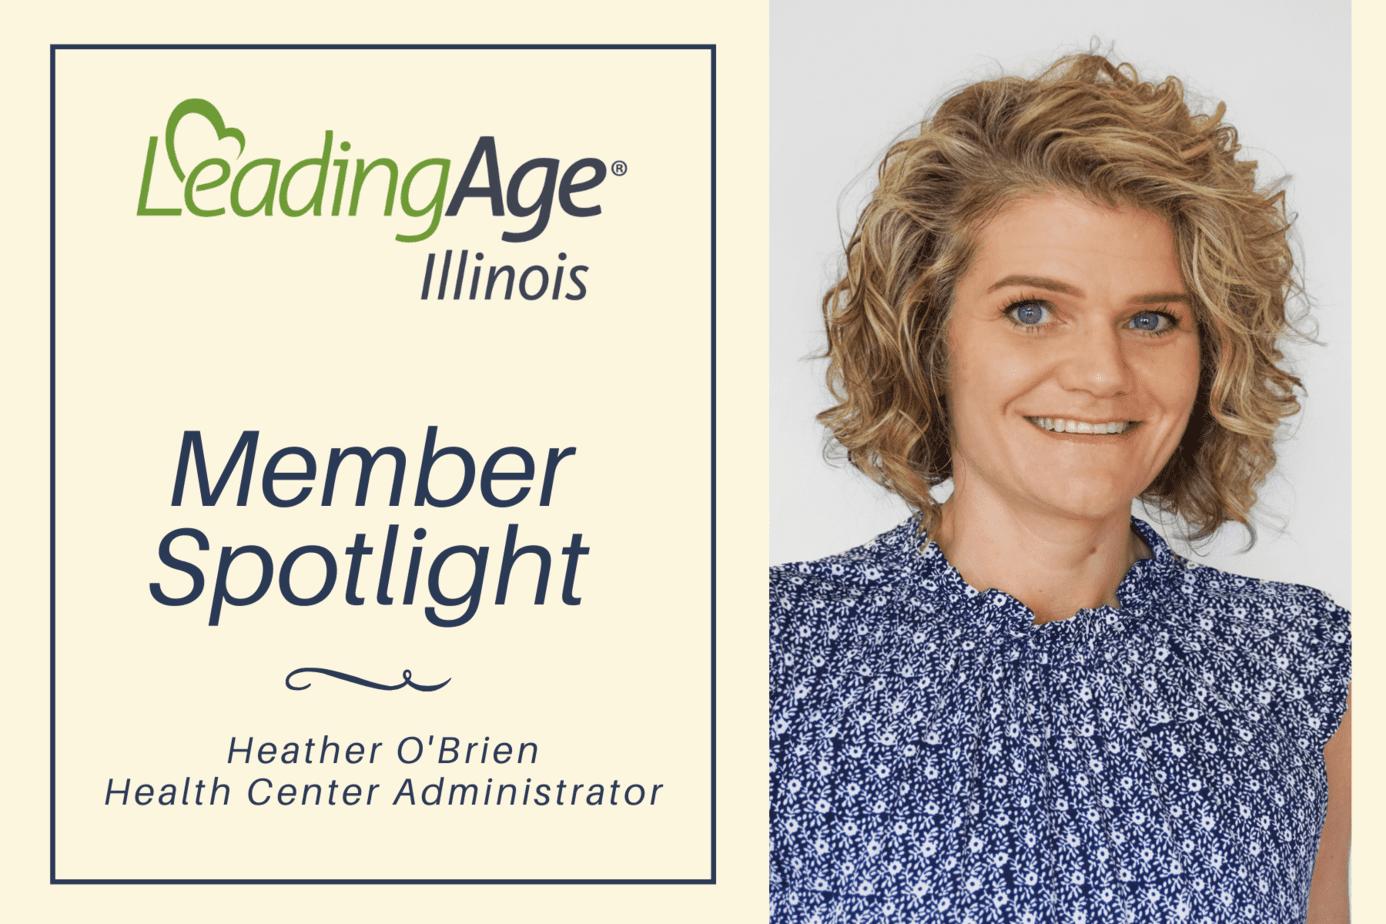 LeadingAge Illinois Features Snyder Village